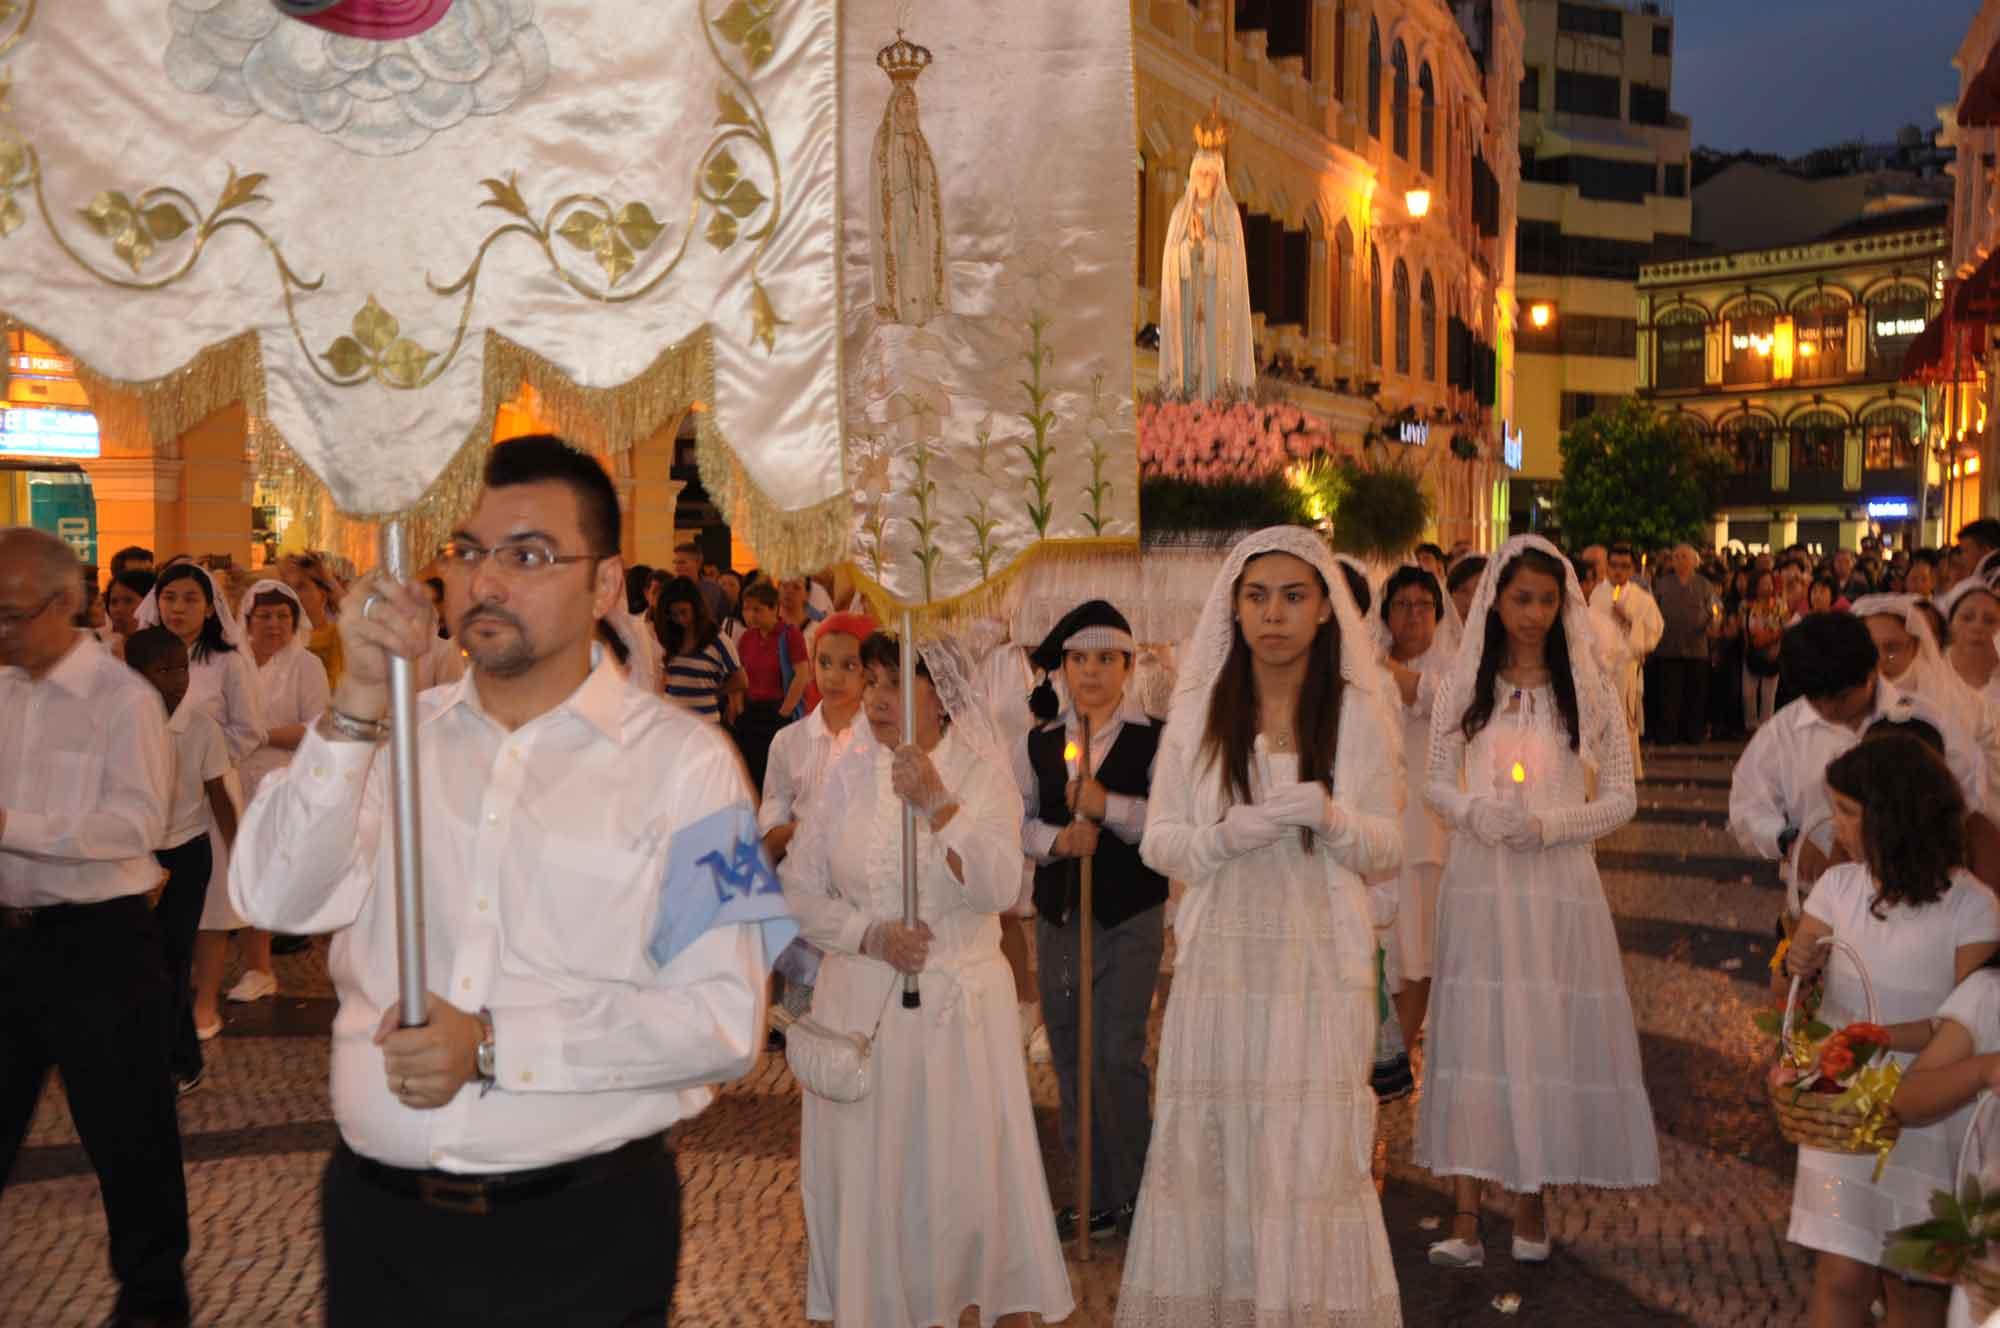 Macau's Our Lady of Fatima Procession at Senado Square